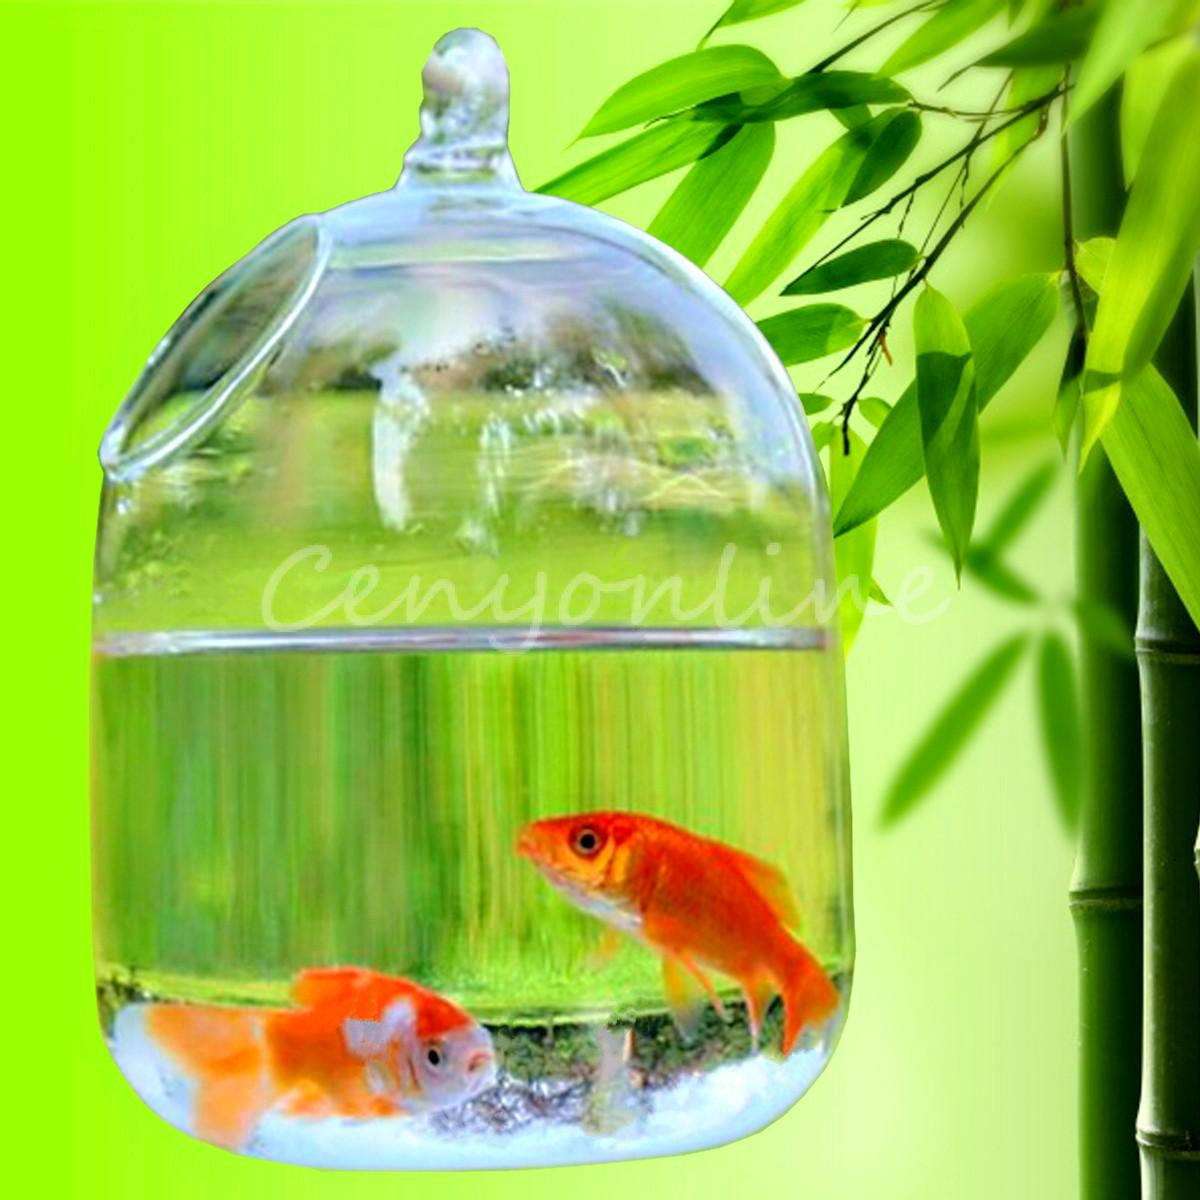 Fish Tank Mini Aquarium Glass Vase Flower Hydroponic Container Pot L 16cm W 10cm